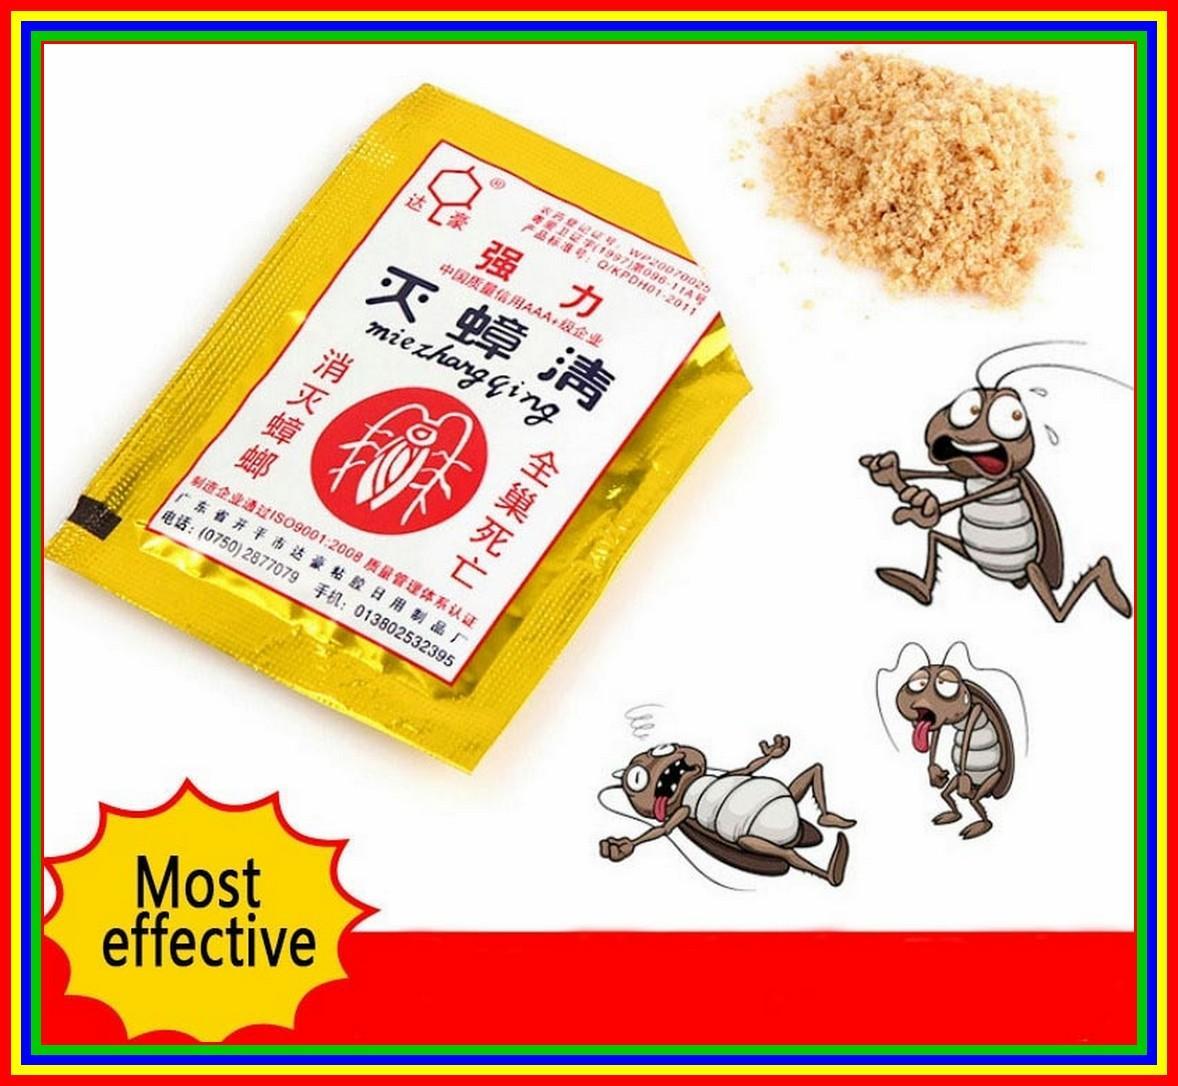 Miezhangqing Bubuk Racun Anti Kecoa Semut 1Pcs